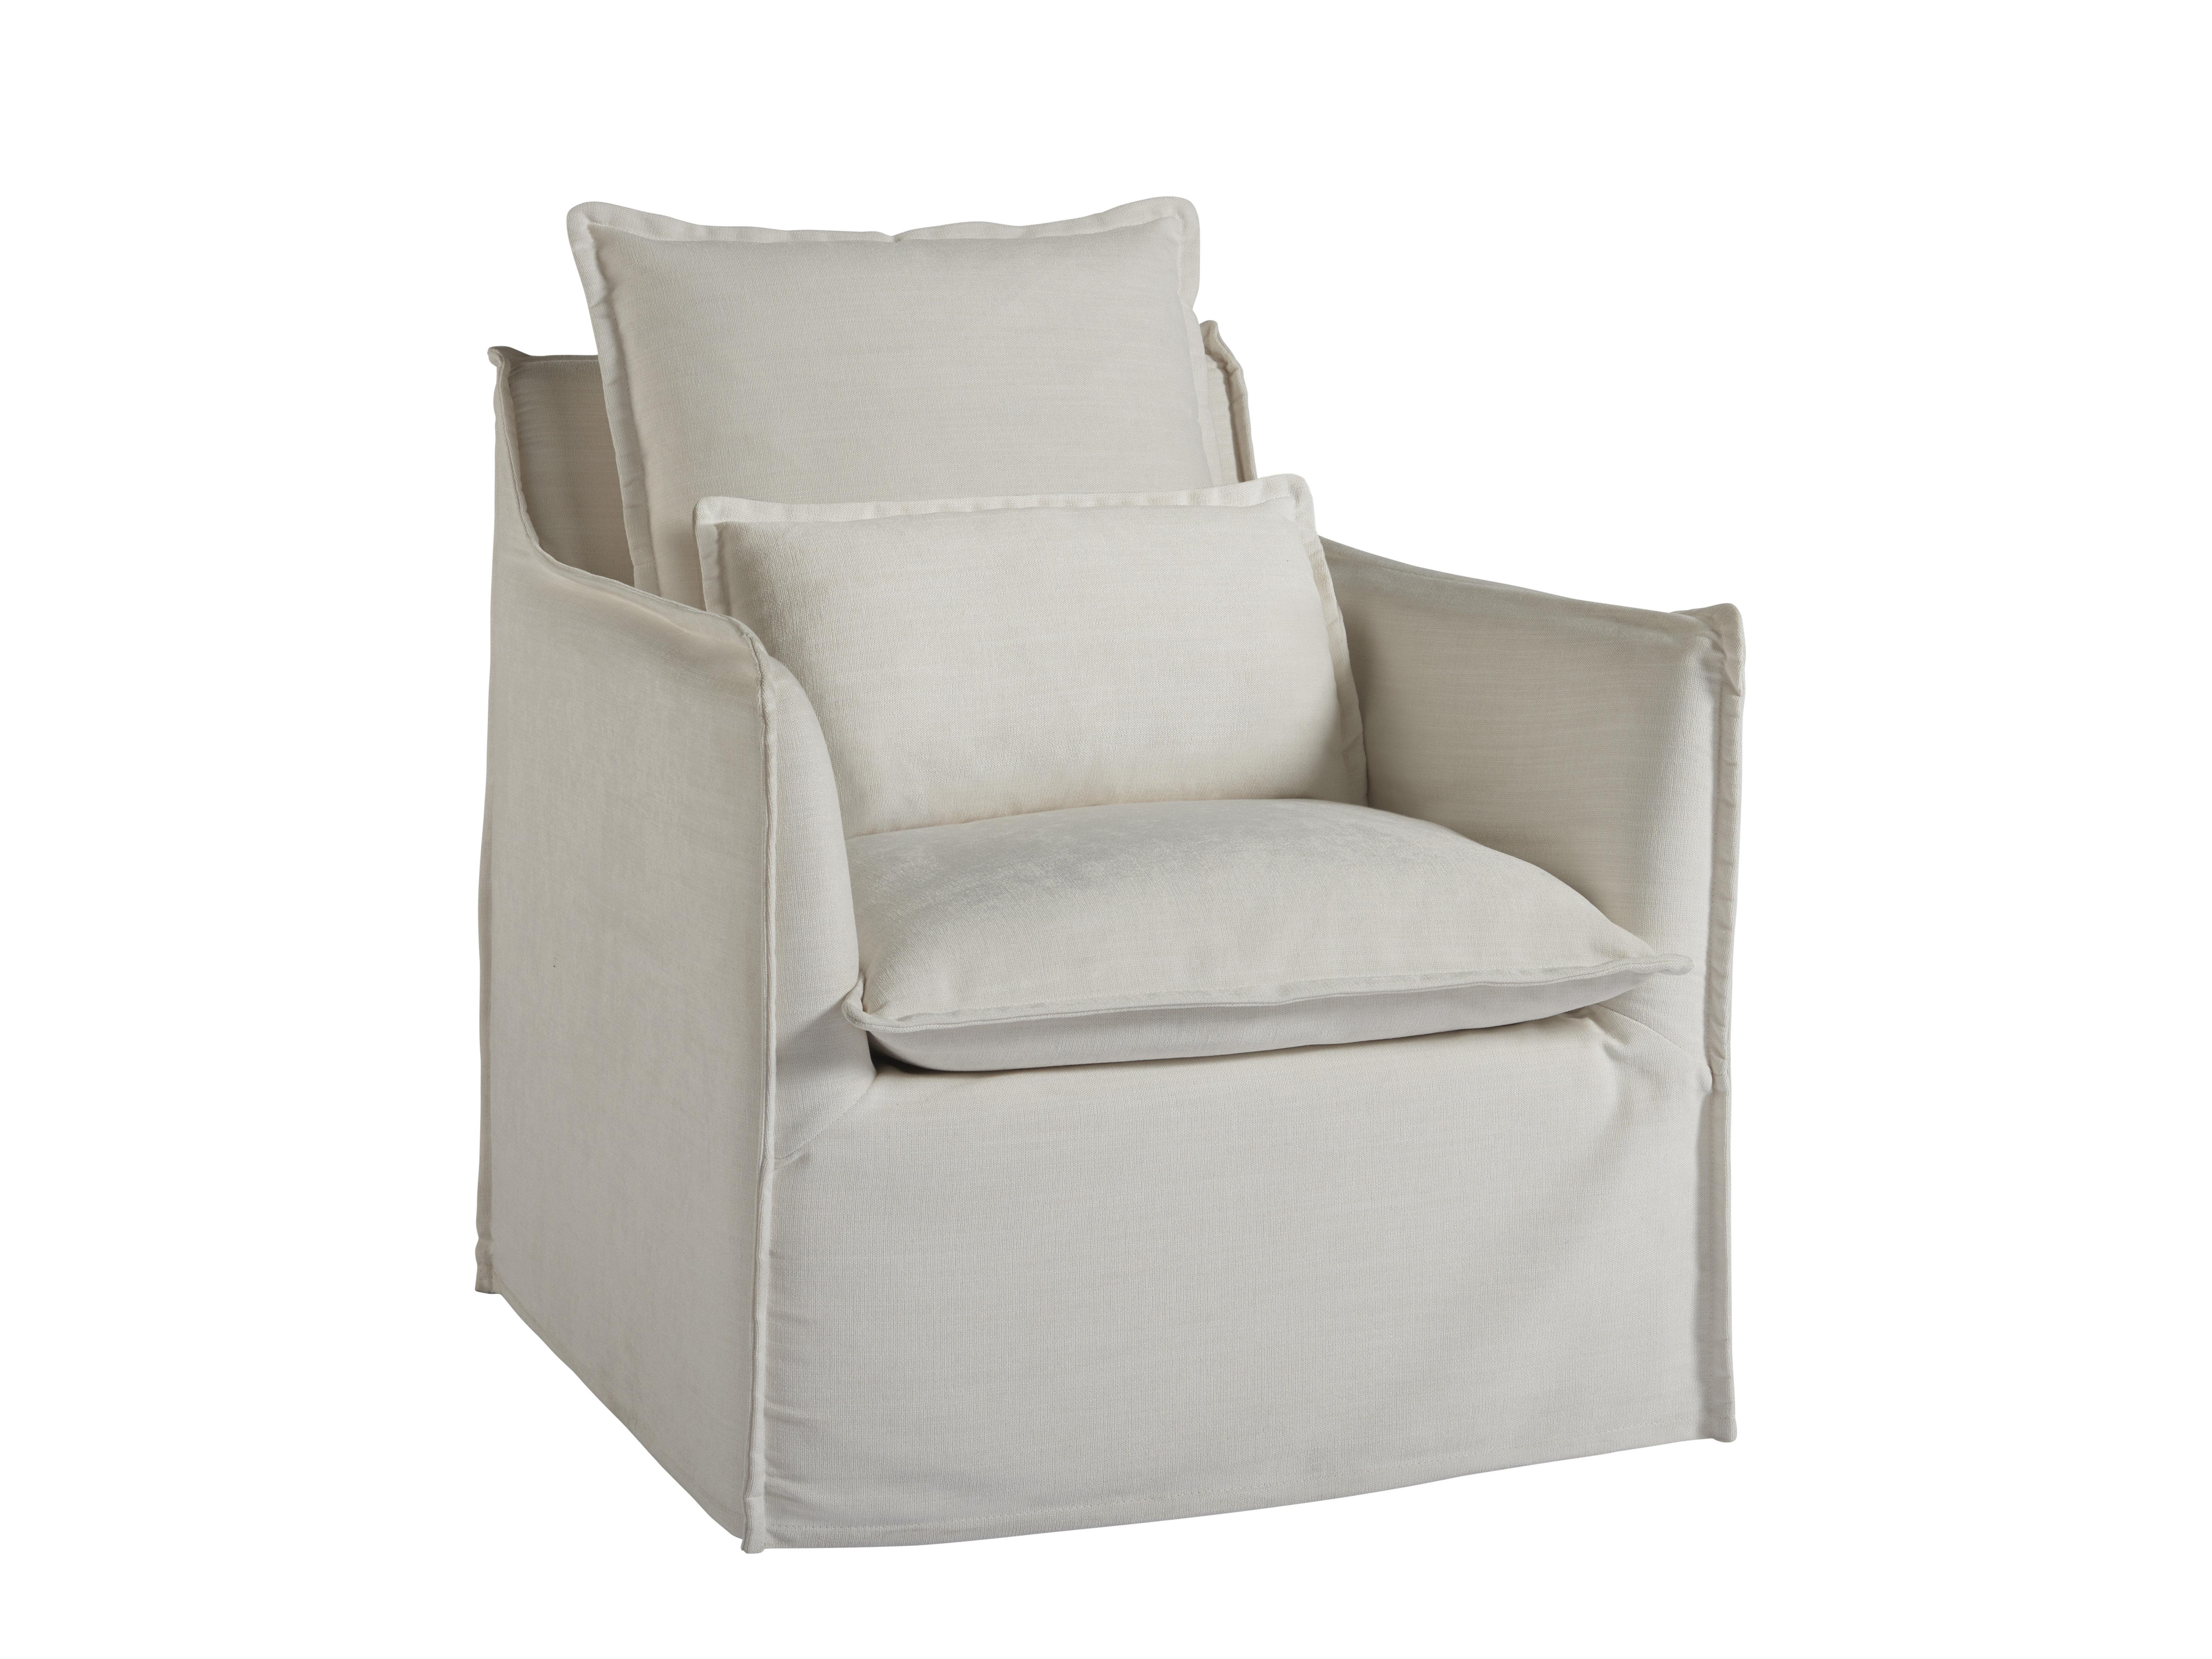 Sensational Coastal Living By Universal Furniture Siesta Key Swivel Machost Co Dining Chair Design Ideas Machostcouk